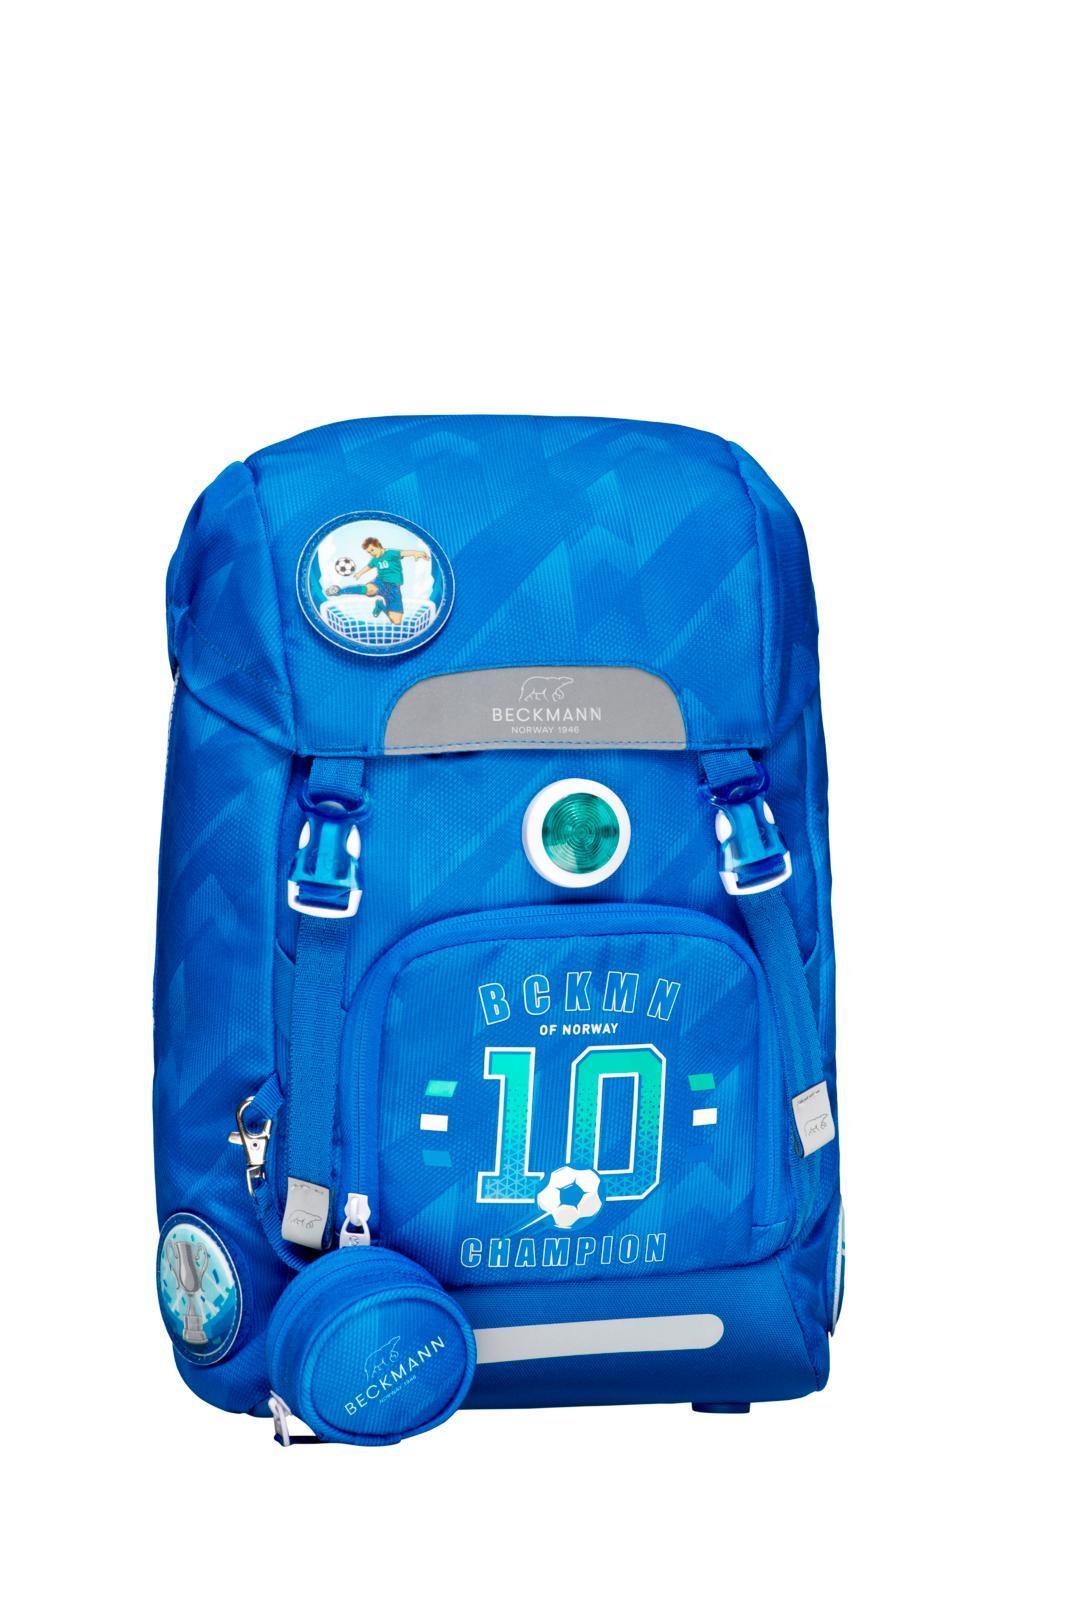 bbe9c37b Latest Beckmann Ergonomic school bag Kids Backpacks Products   Enjoy ...